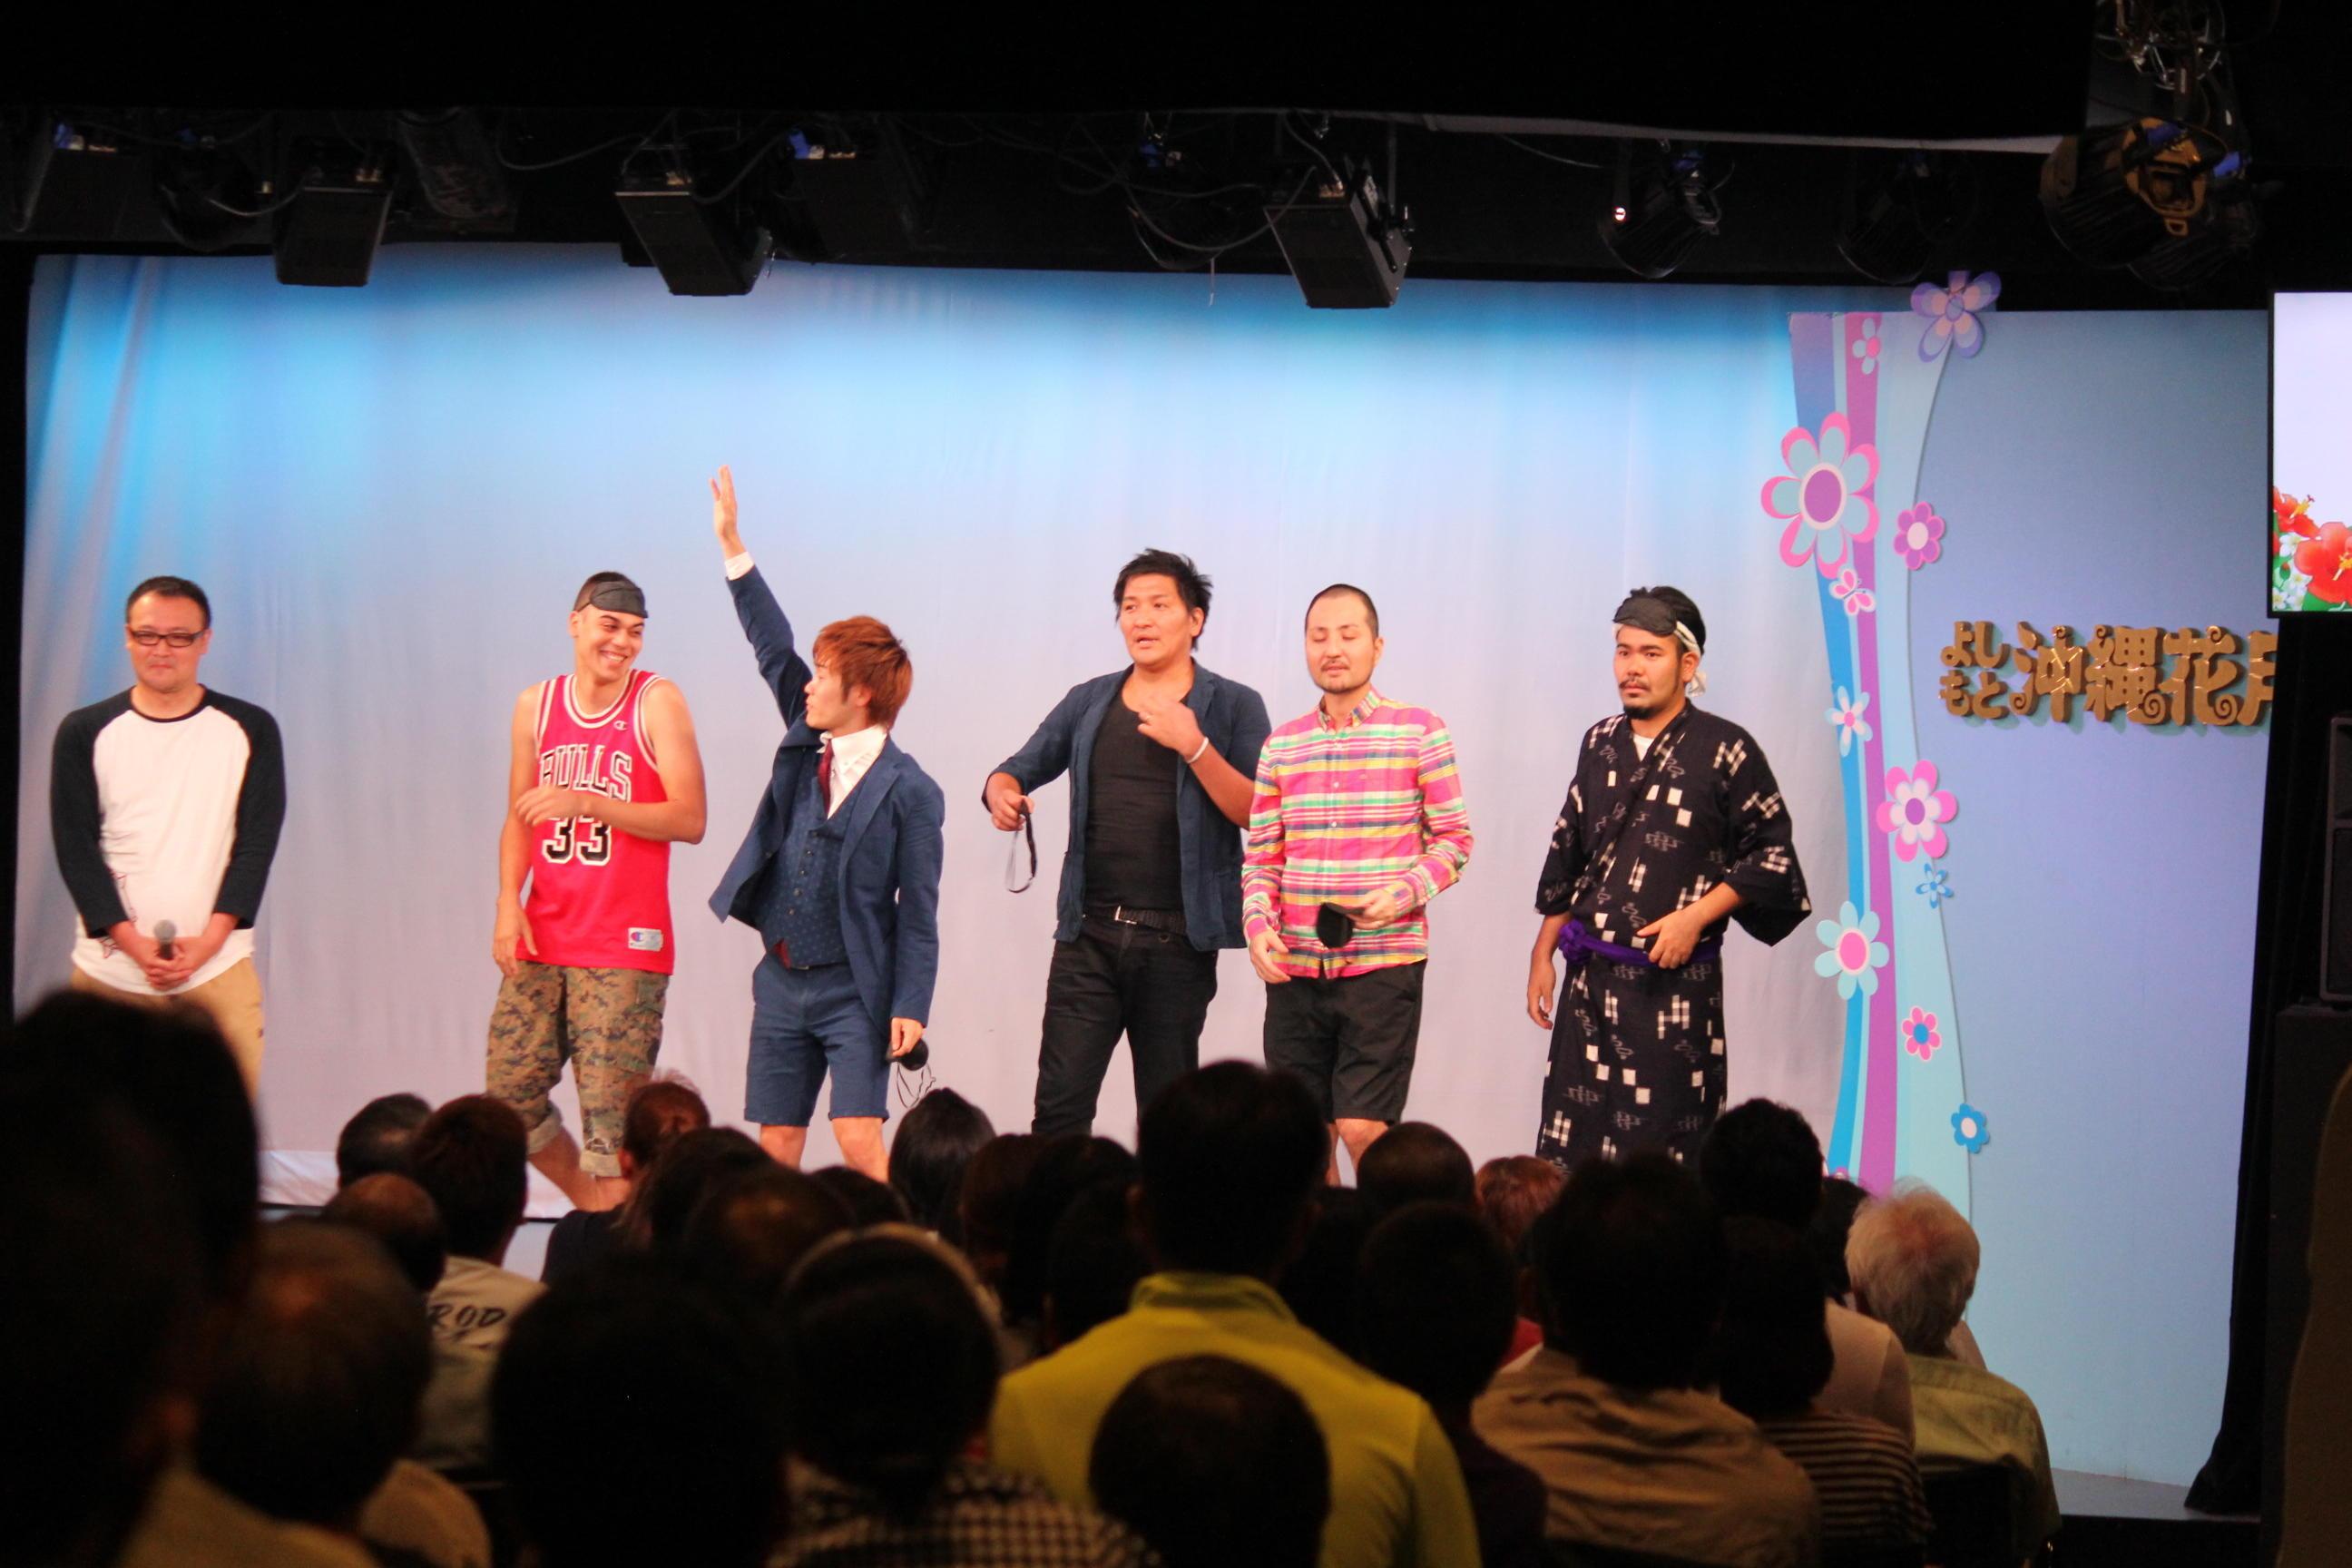 http://news.yoshimoto.co.jp/20161018173609-39730fa67e65da26d178e7149788f451a9b8eb75.jpg